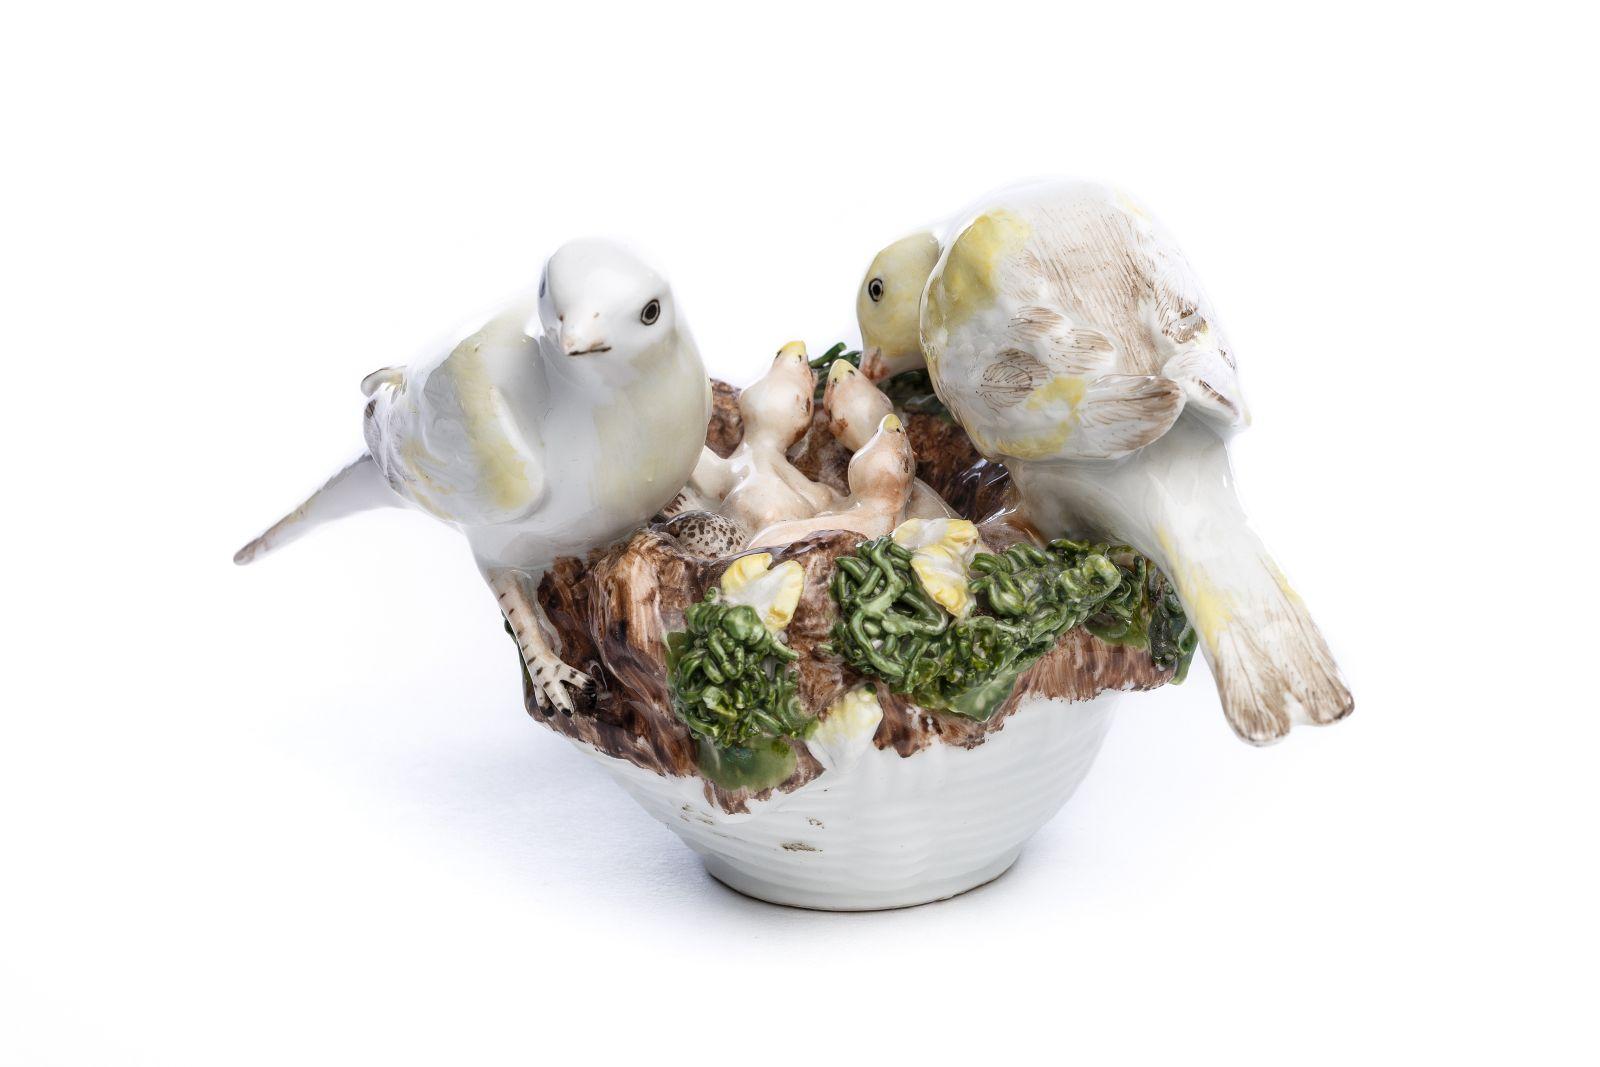 "#49 Porcelain group ""Bird couple with cubs in the nest"", Meissen 1750 | Porzellangruppe ""Vogelpaar mit Jungen im Nest"", Meissen 1750 Image"